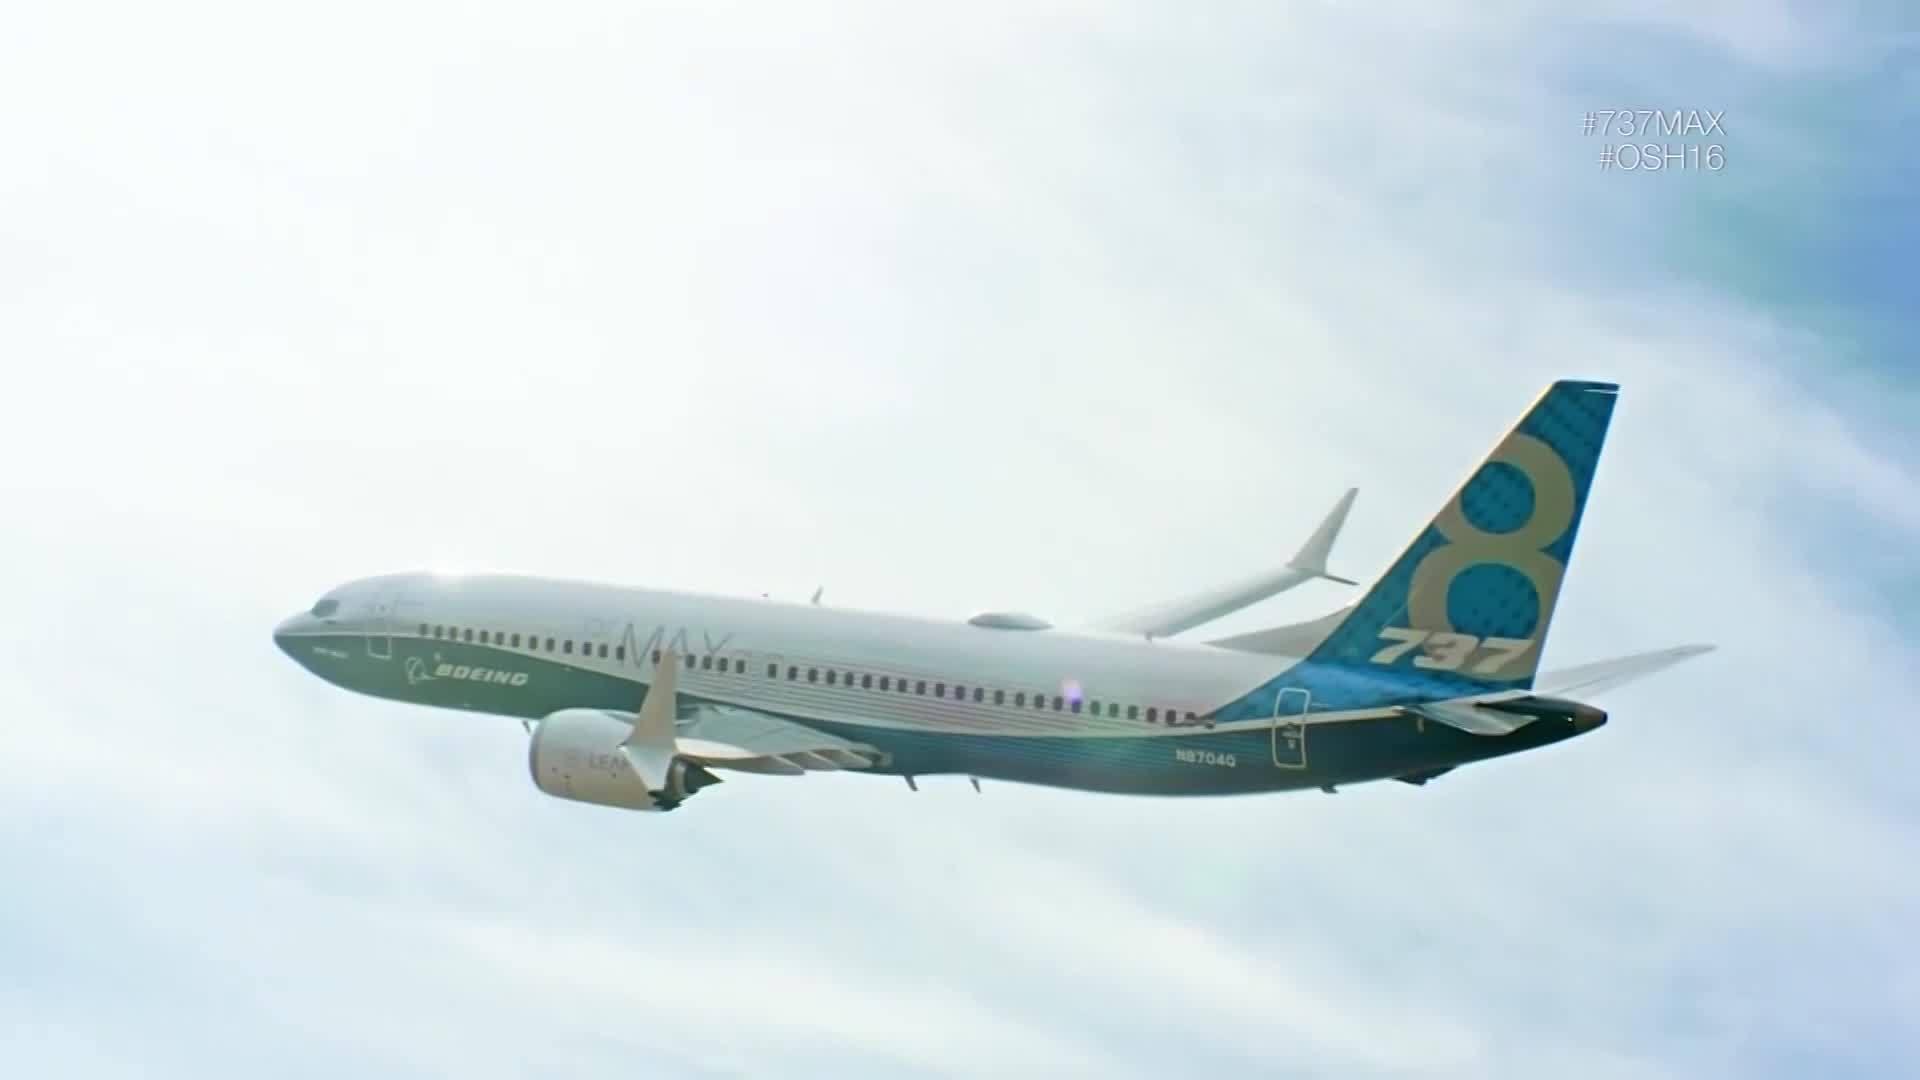 Boeing__FAA_at_center_of_Congress_hearin_6_20190327225419-842137445